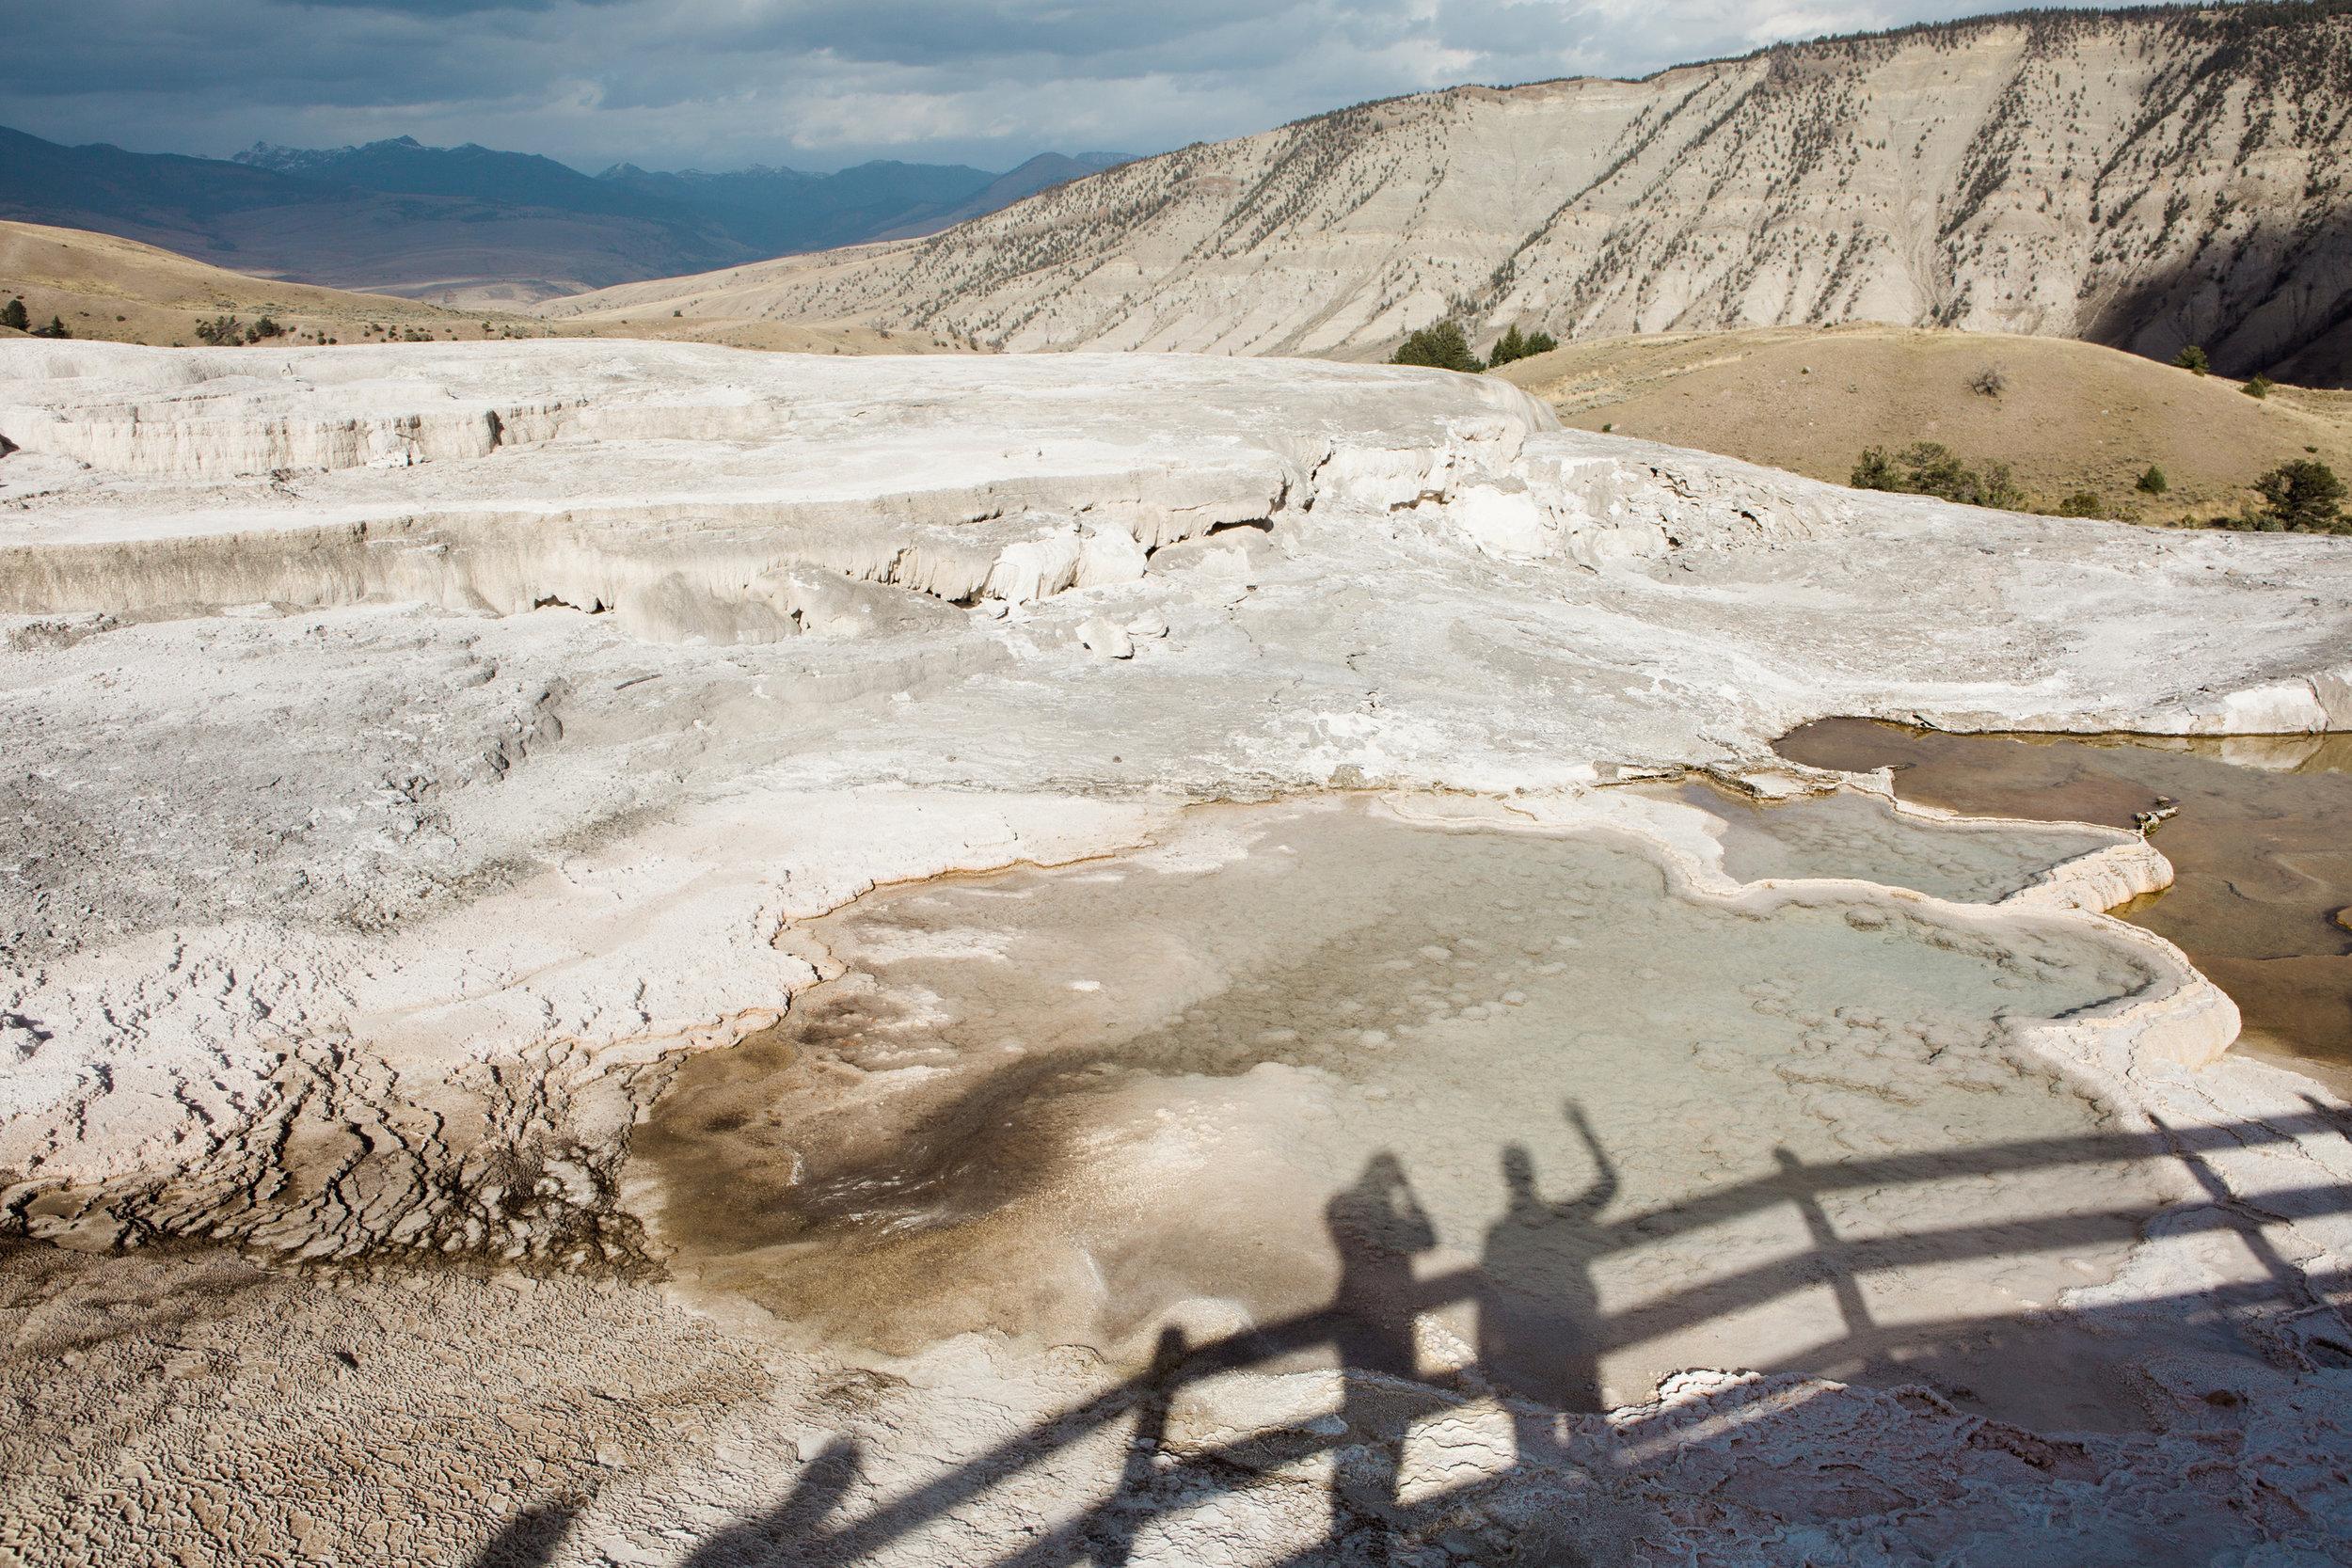 CindyGiovagnoli_Yellowstone_National_Park_Montana_Wyoming_bison_pronghorn_snow_elk_truckcamping-005.jpg